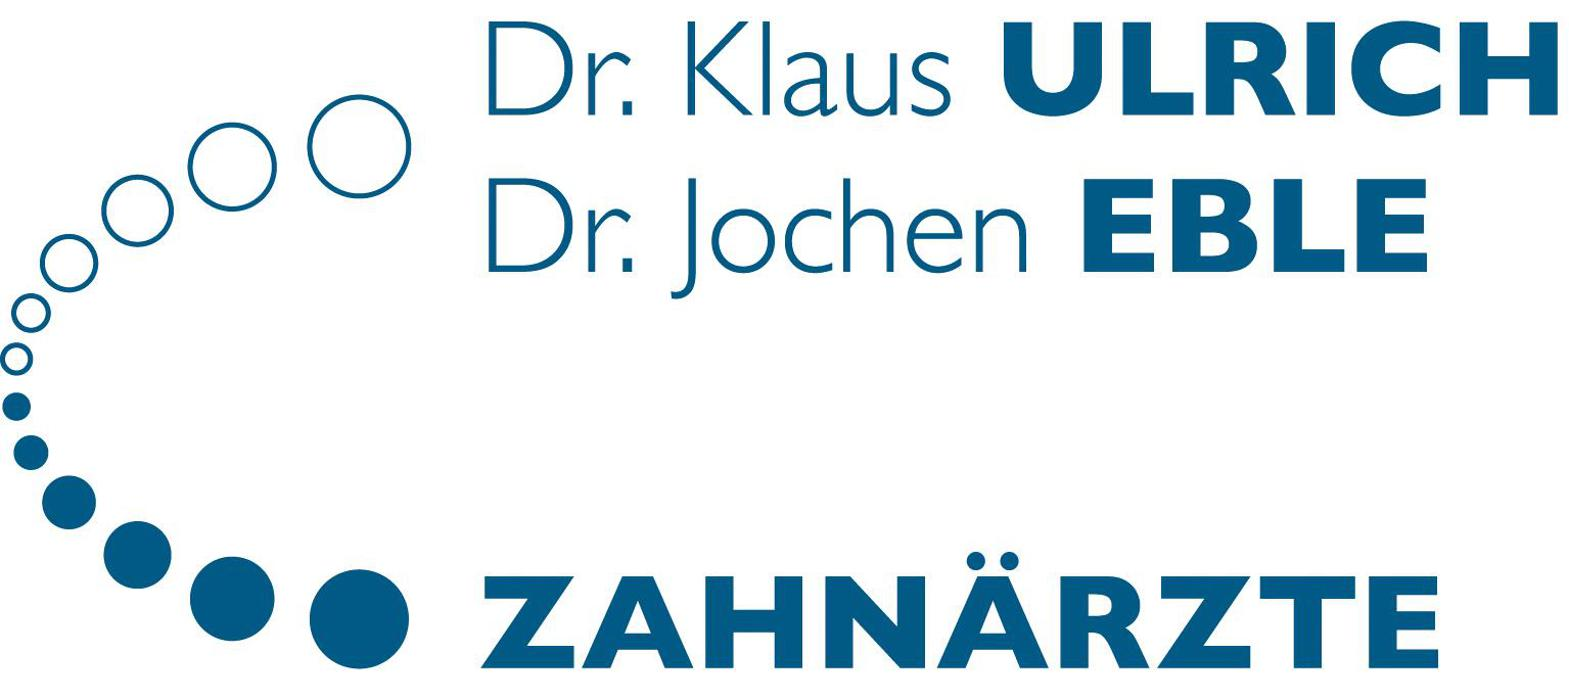 Bild zu Zahnärzte Biberach Dr. Eble & Dr. Ulrich in Biberach an der Riss